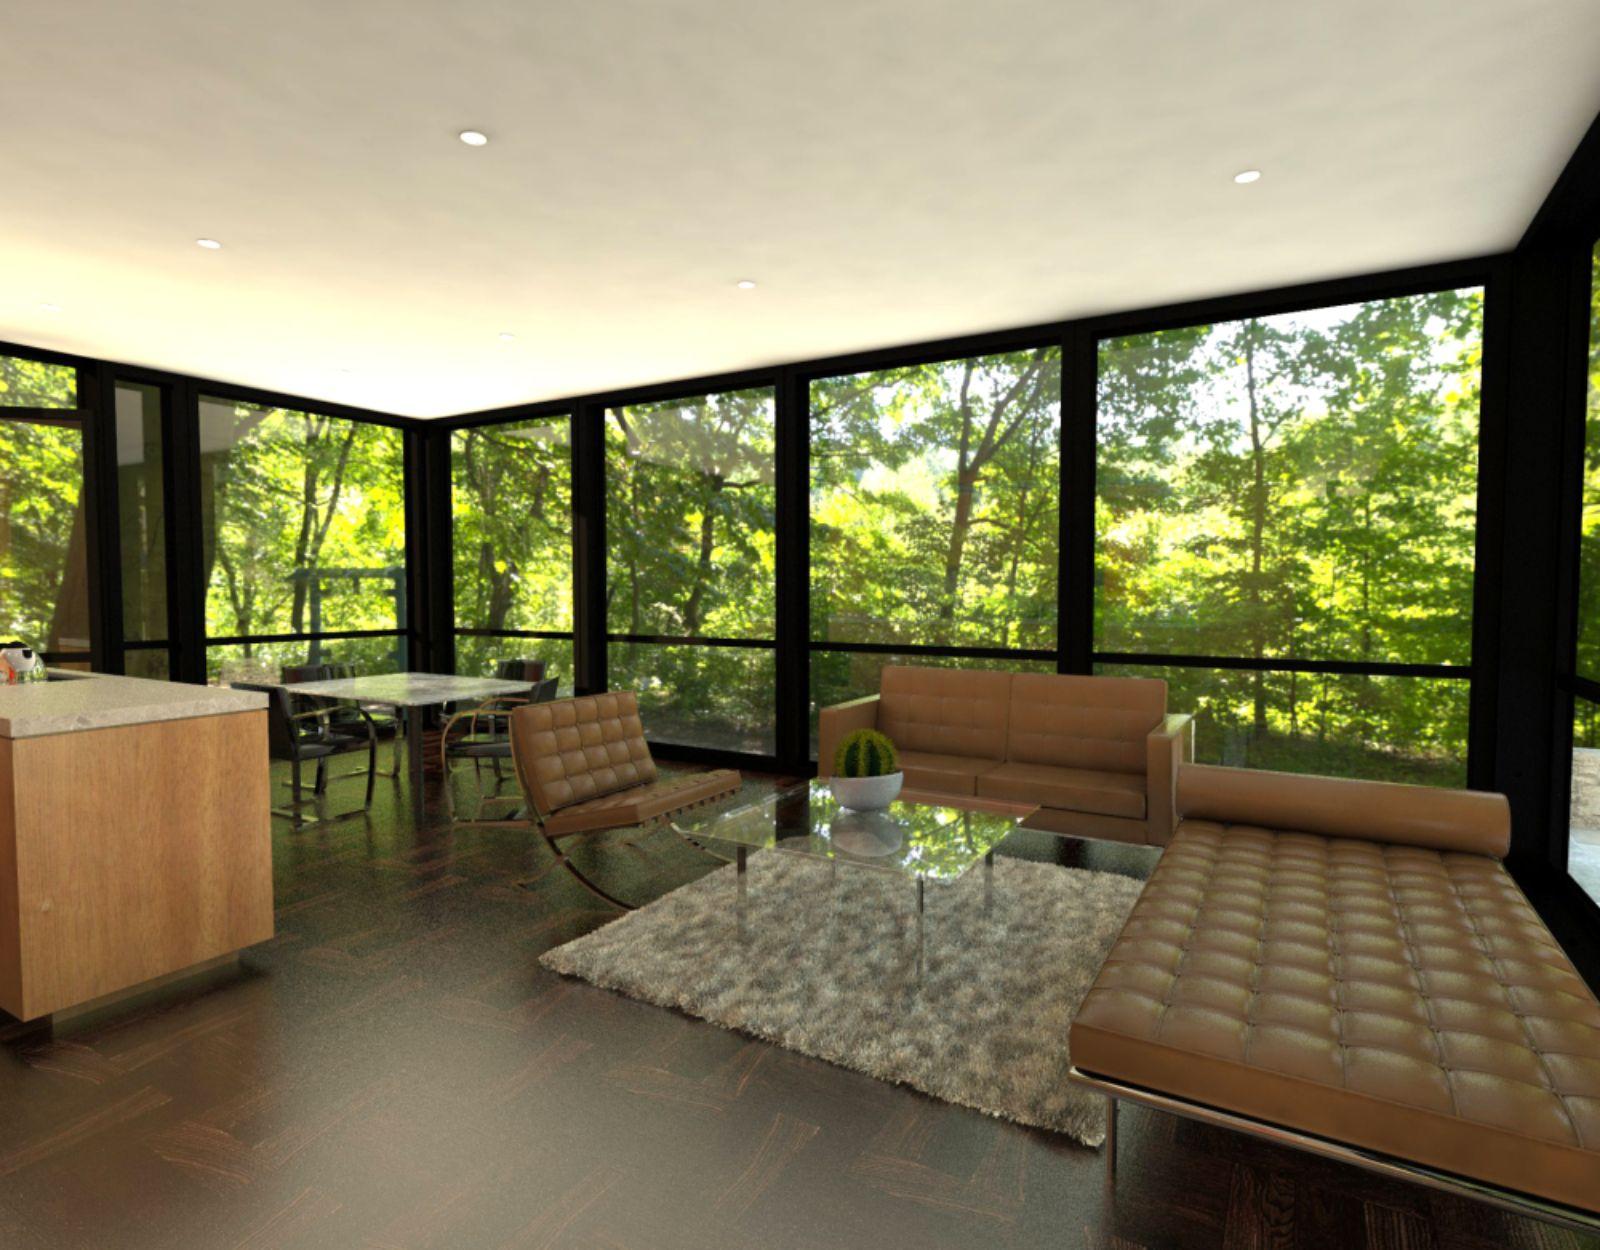 Philip Johnson Glass House modular-glass-house-by-philip-johnson-alan-ritchie